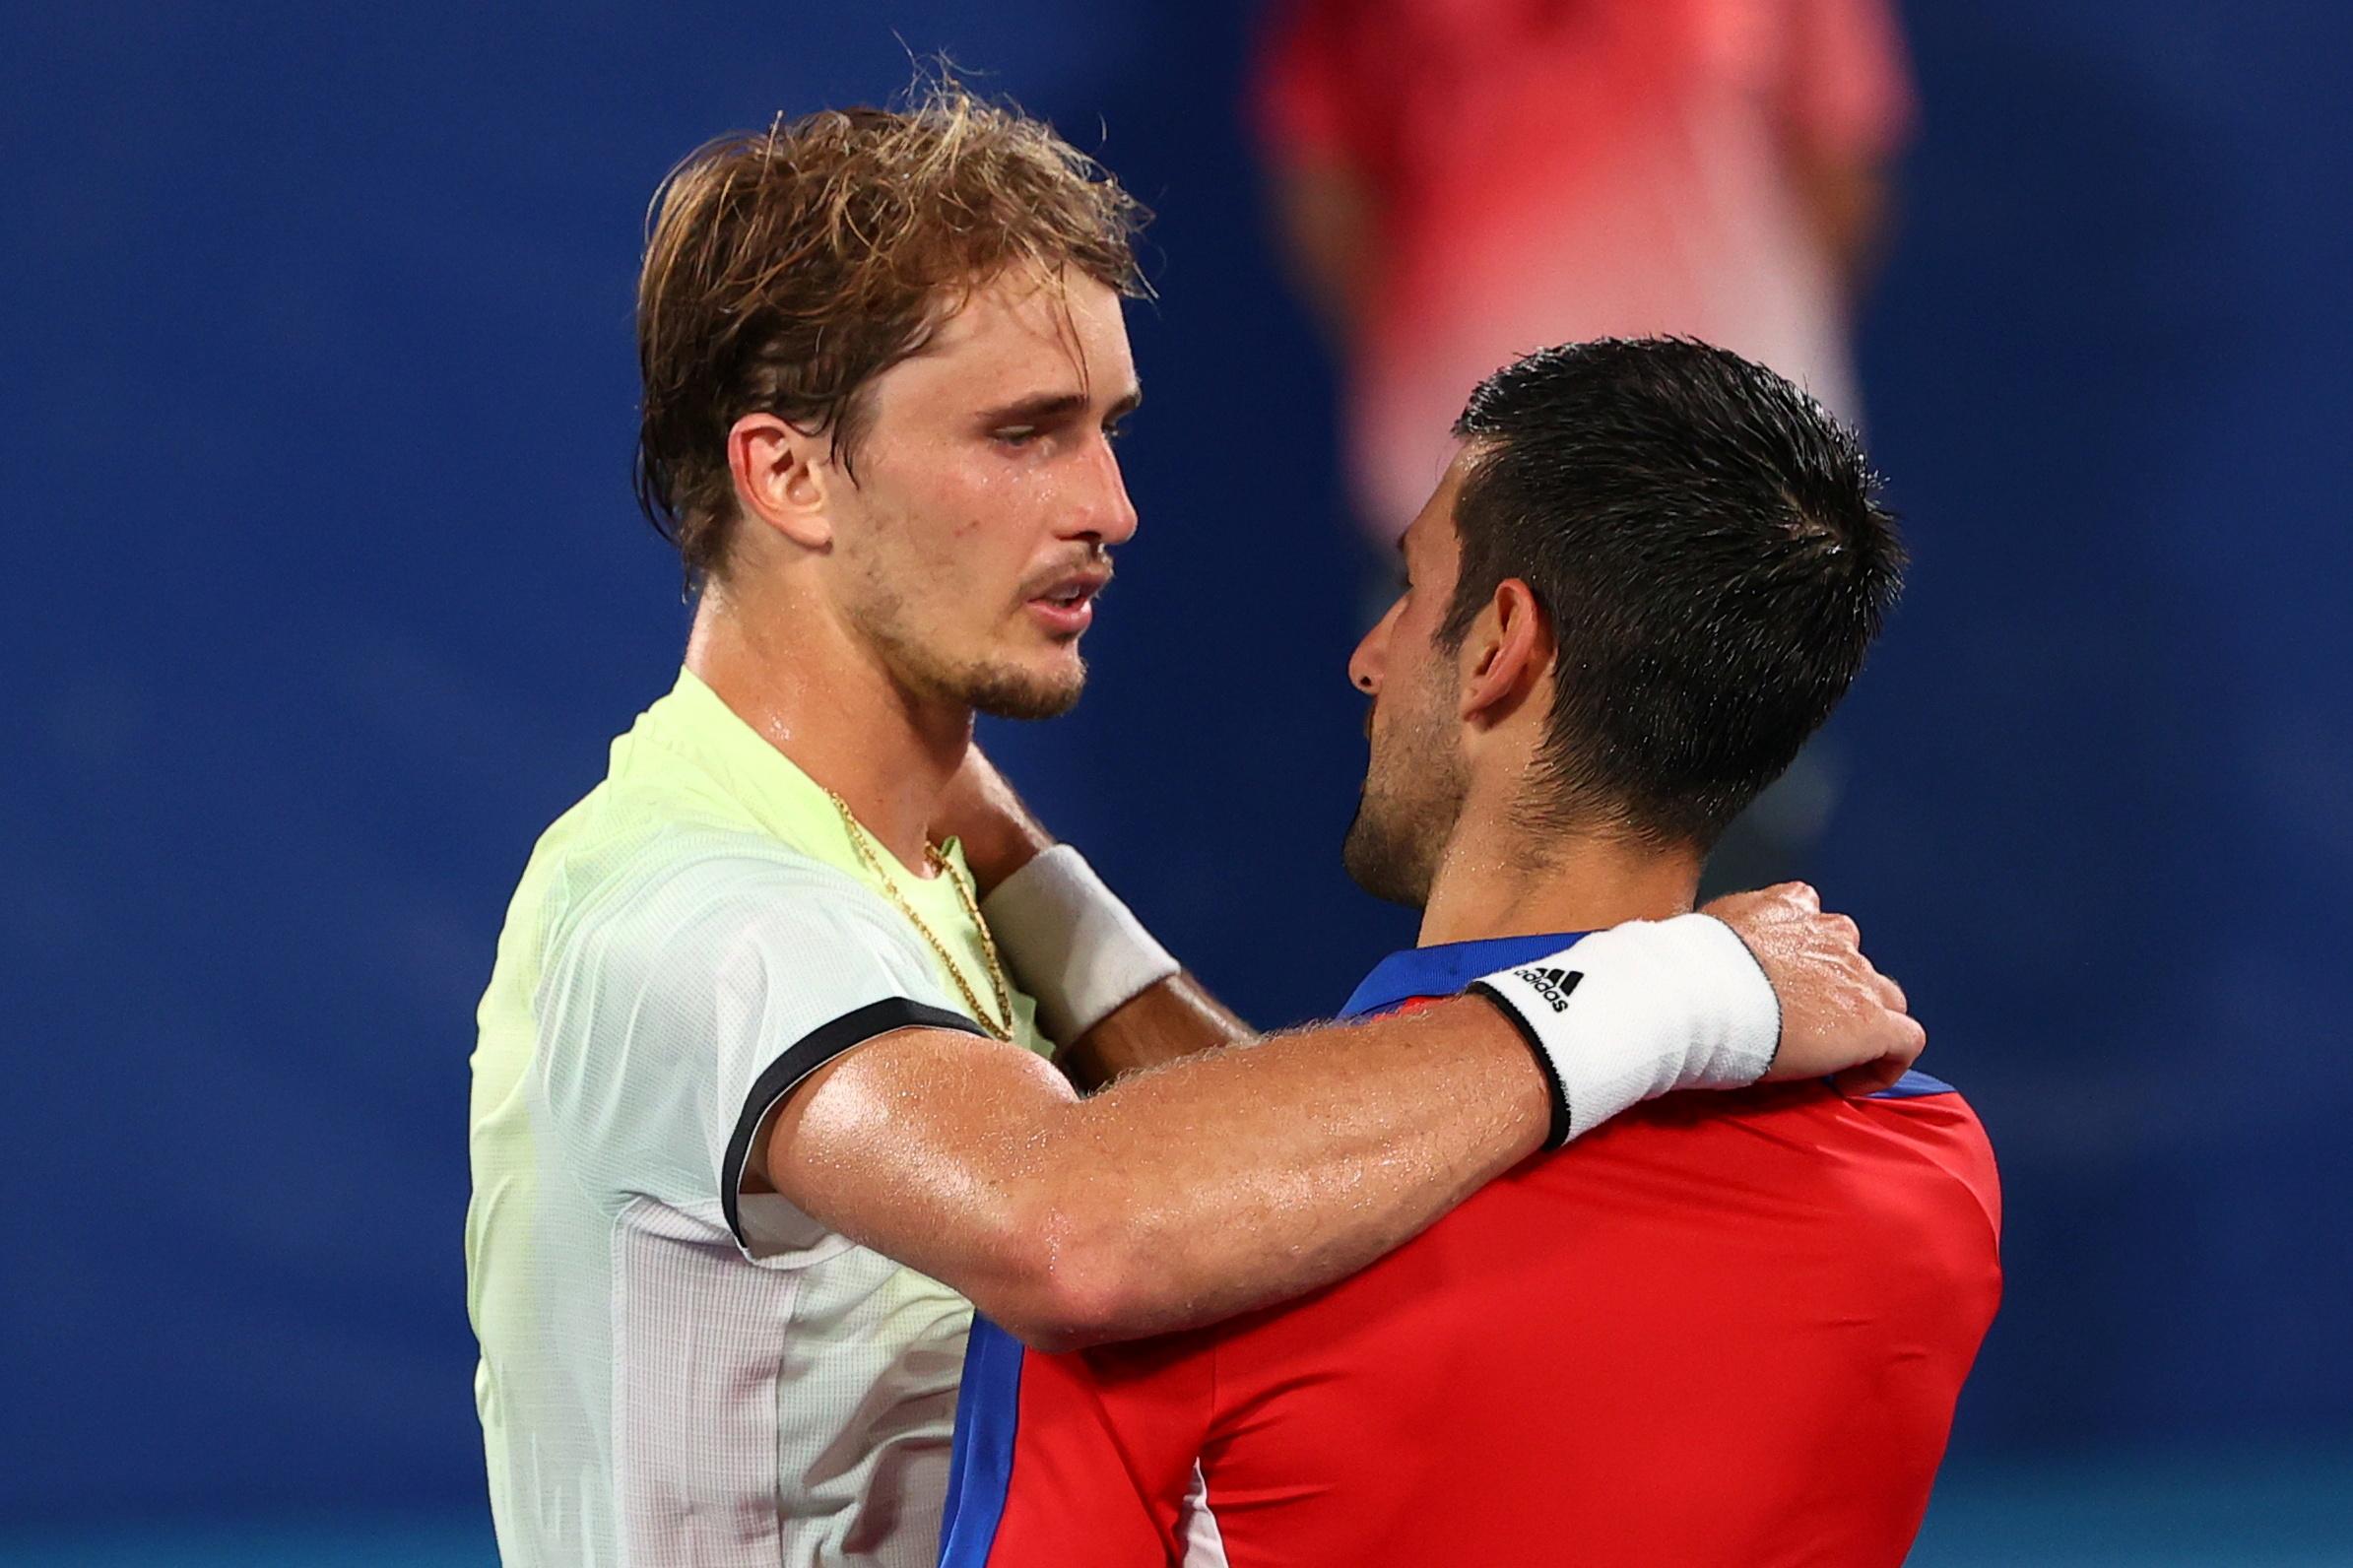 Tennis-Djokovic's Golden Slam dreams dashed by Zverev   Reuters